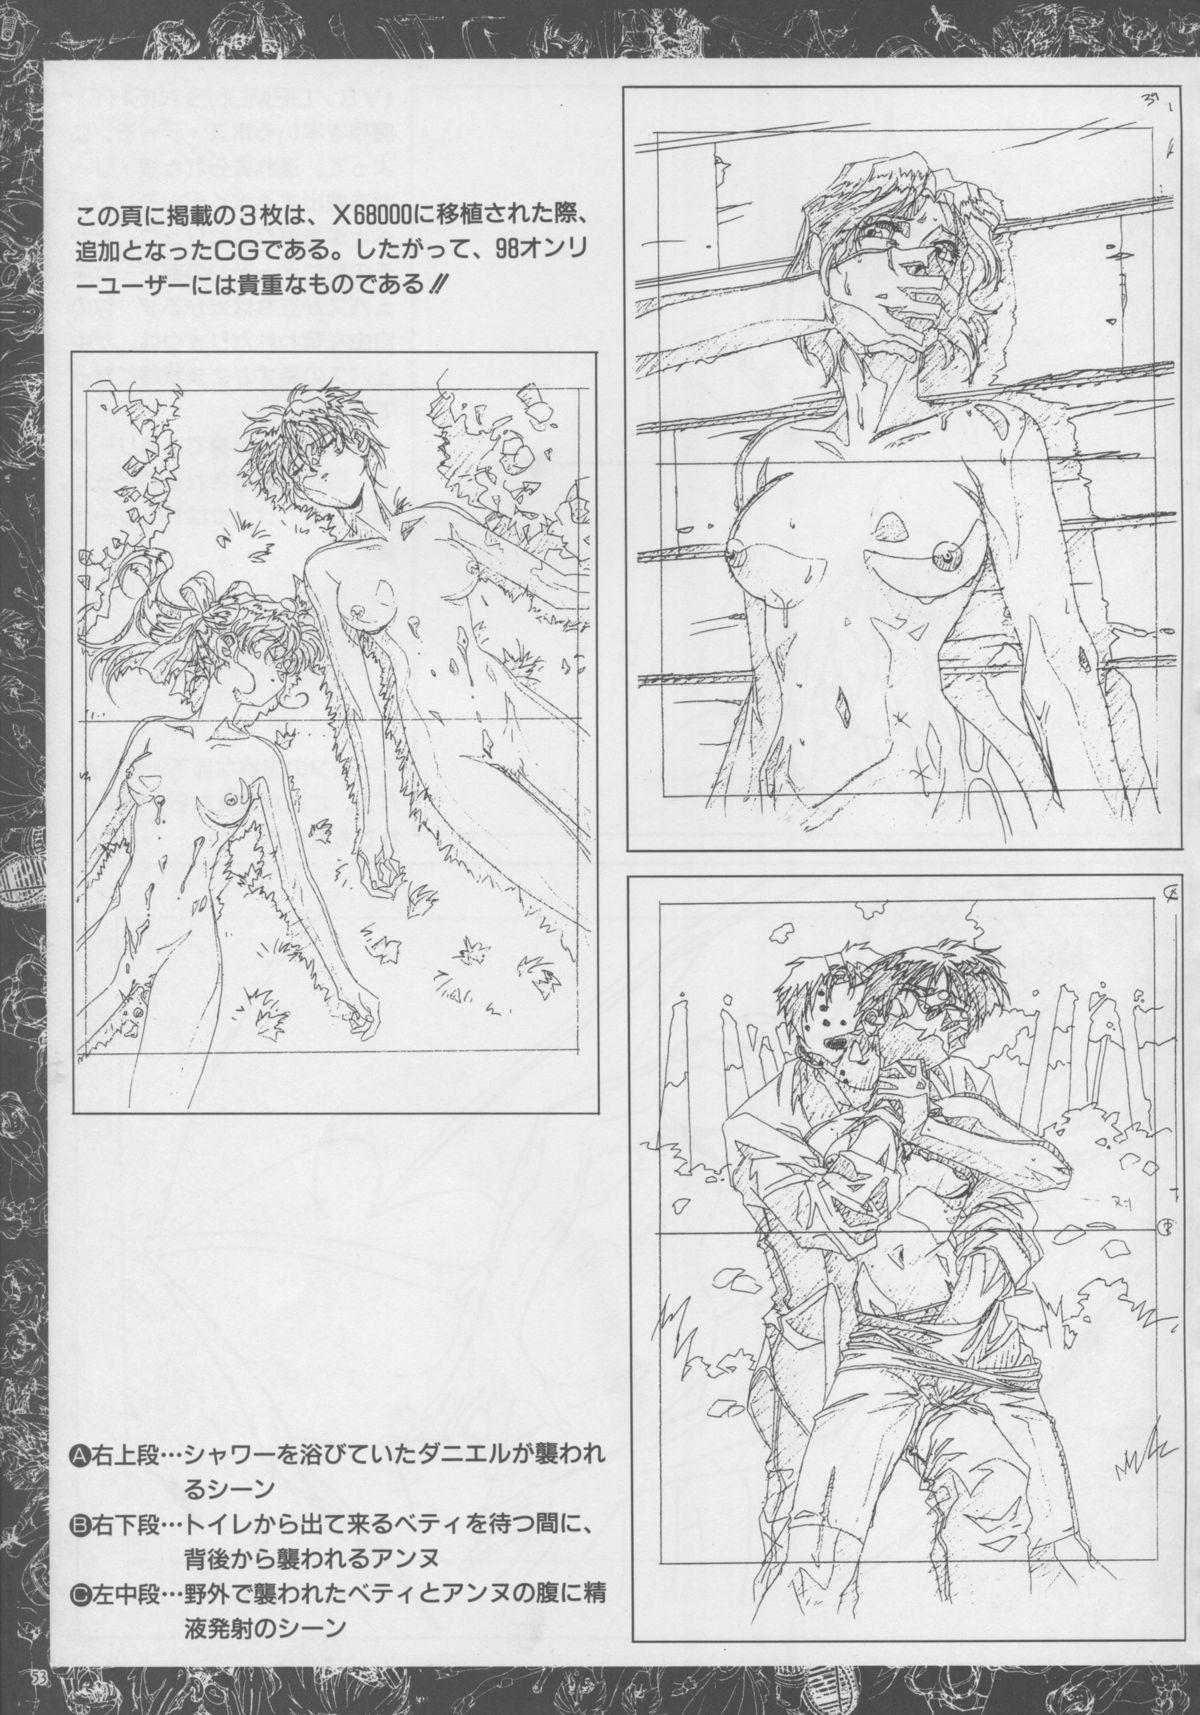 VIPER Series Official Artbook 51